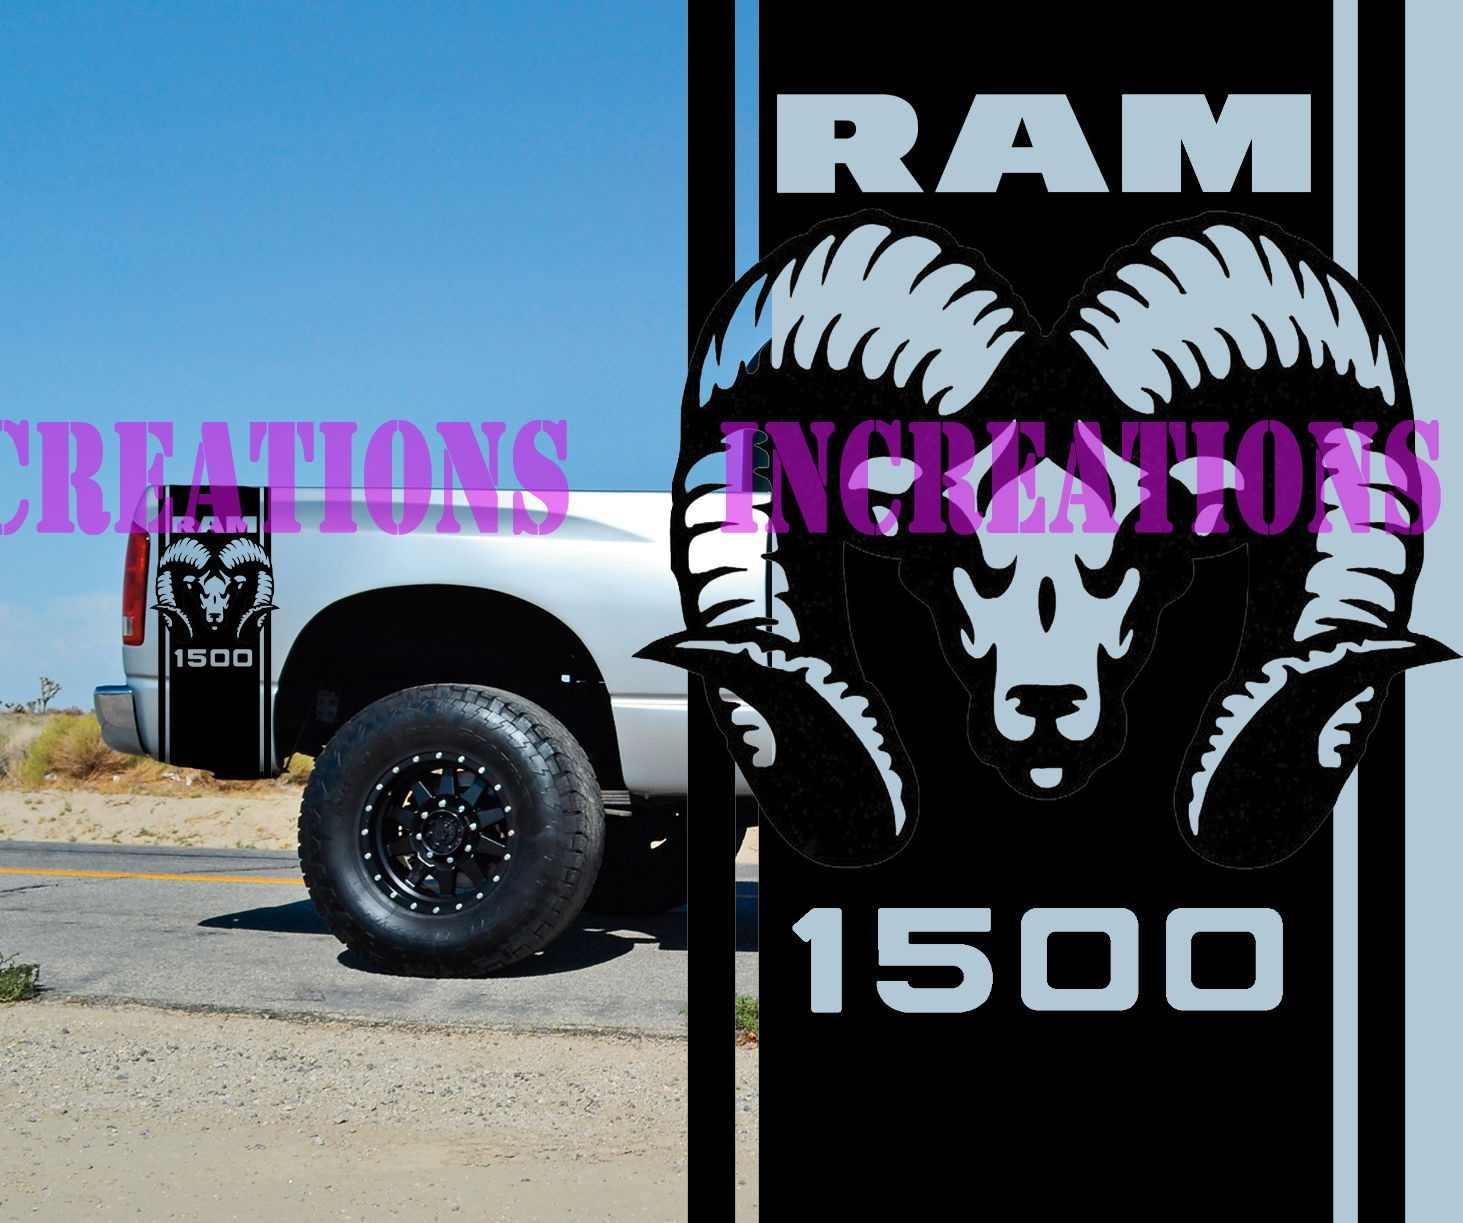 For Universal 1set 2pcs Hemi Dodge Ram 1500 Bed Stripes Truck Decals Mopar Stickers Set Of 2 Racing Car Stickers Aliexpress